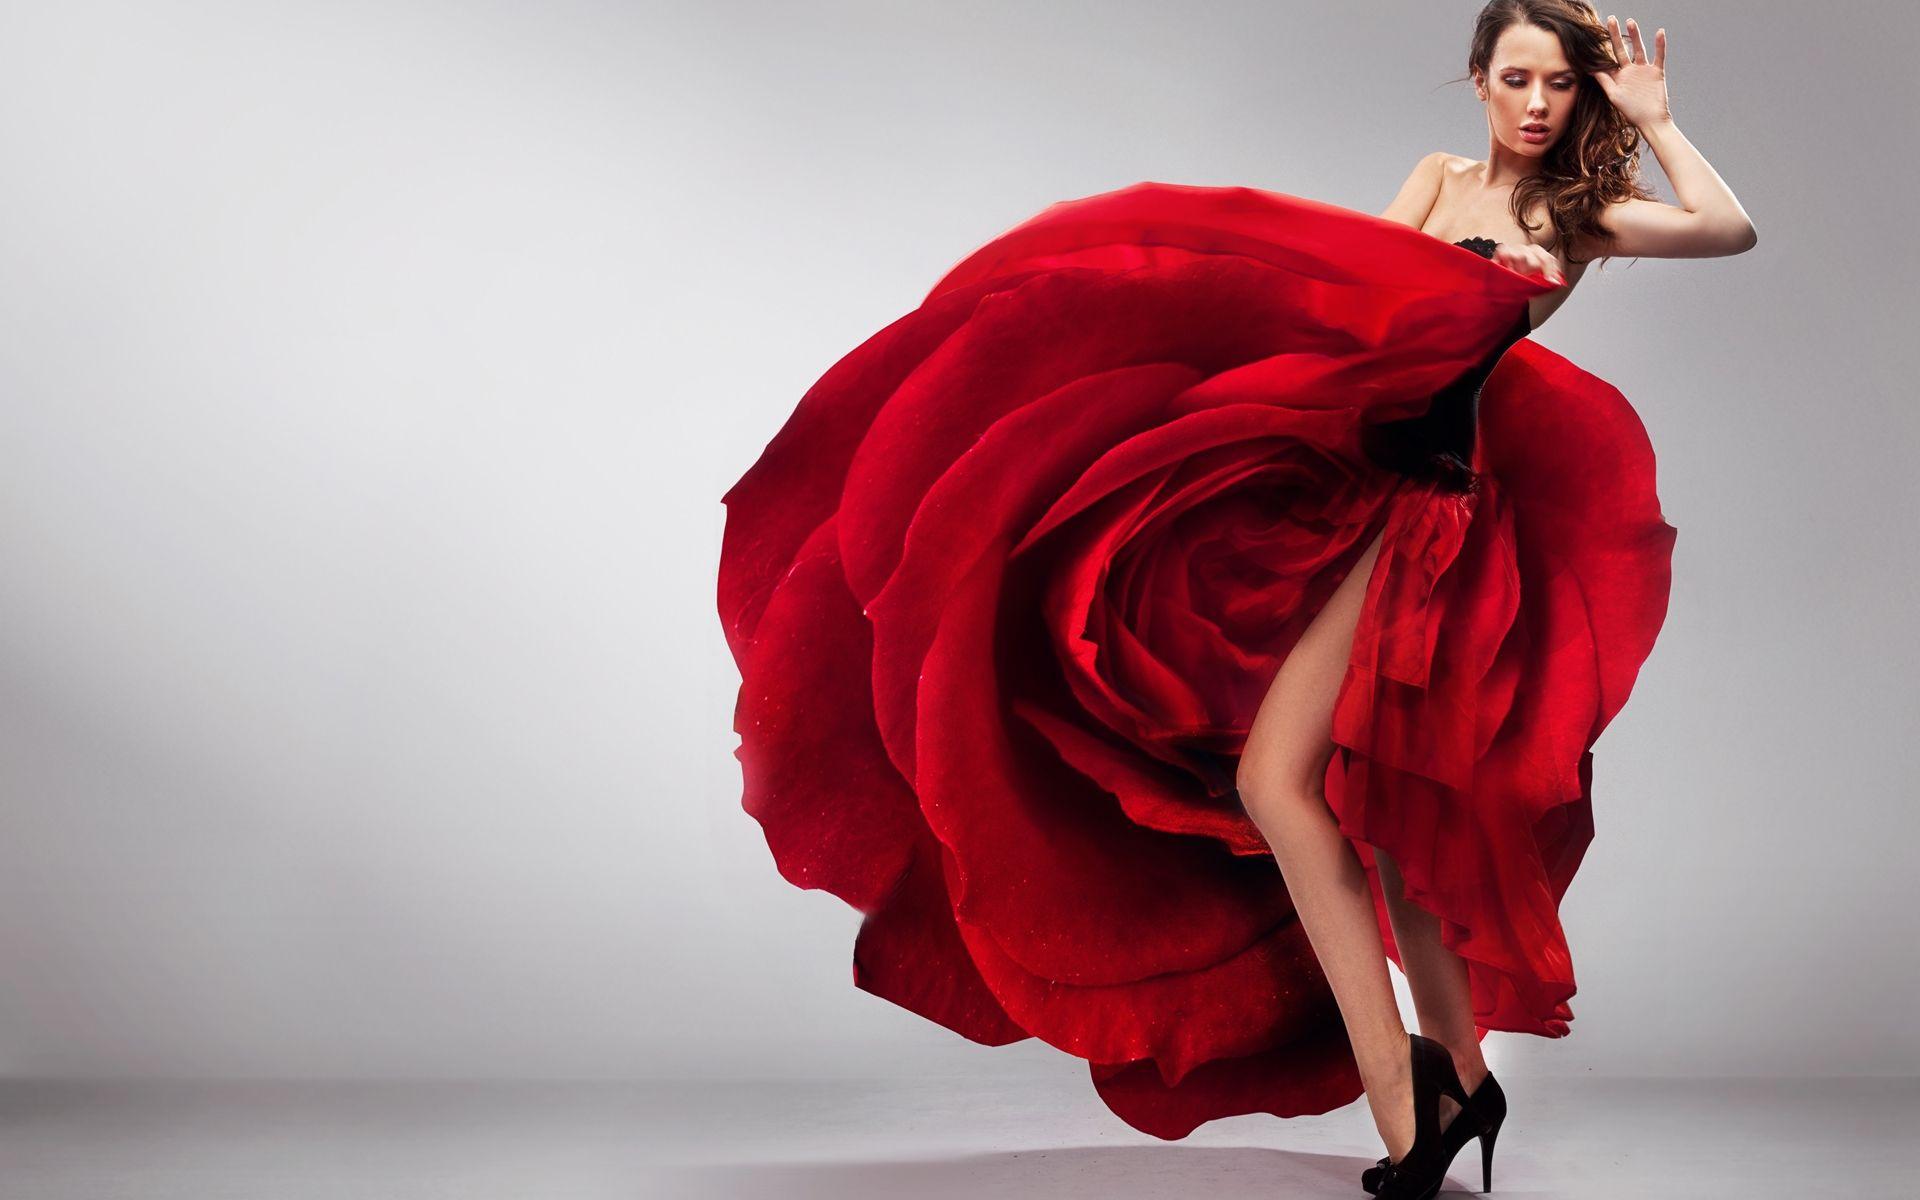 Image detail for flamenco wallpaper a passionate flamenco dance